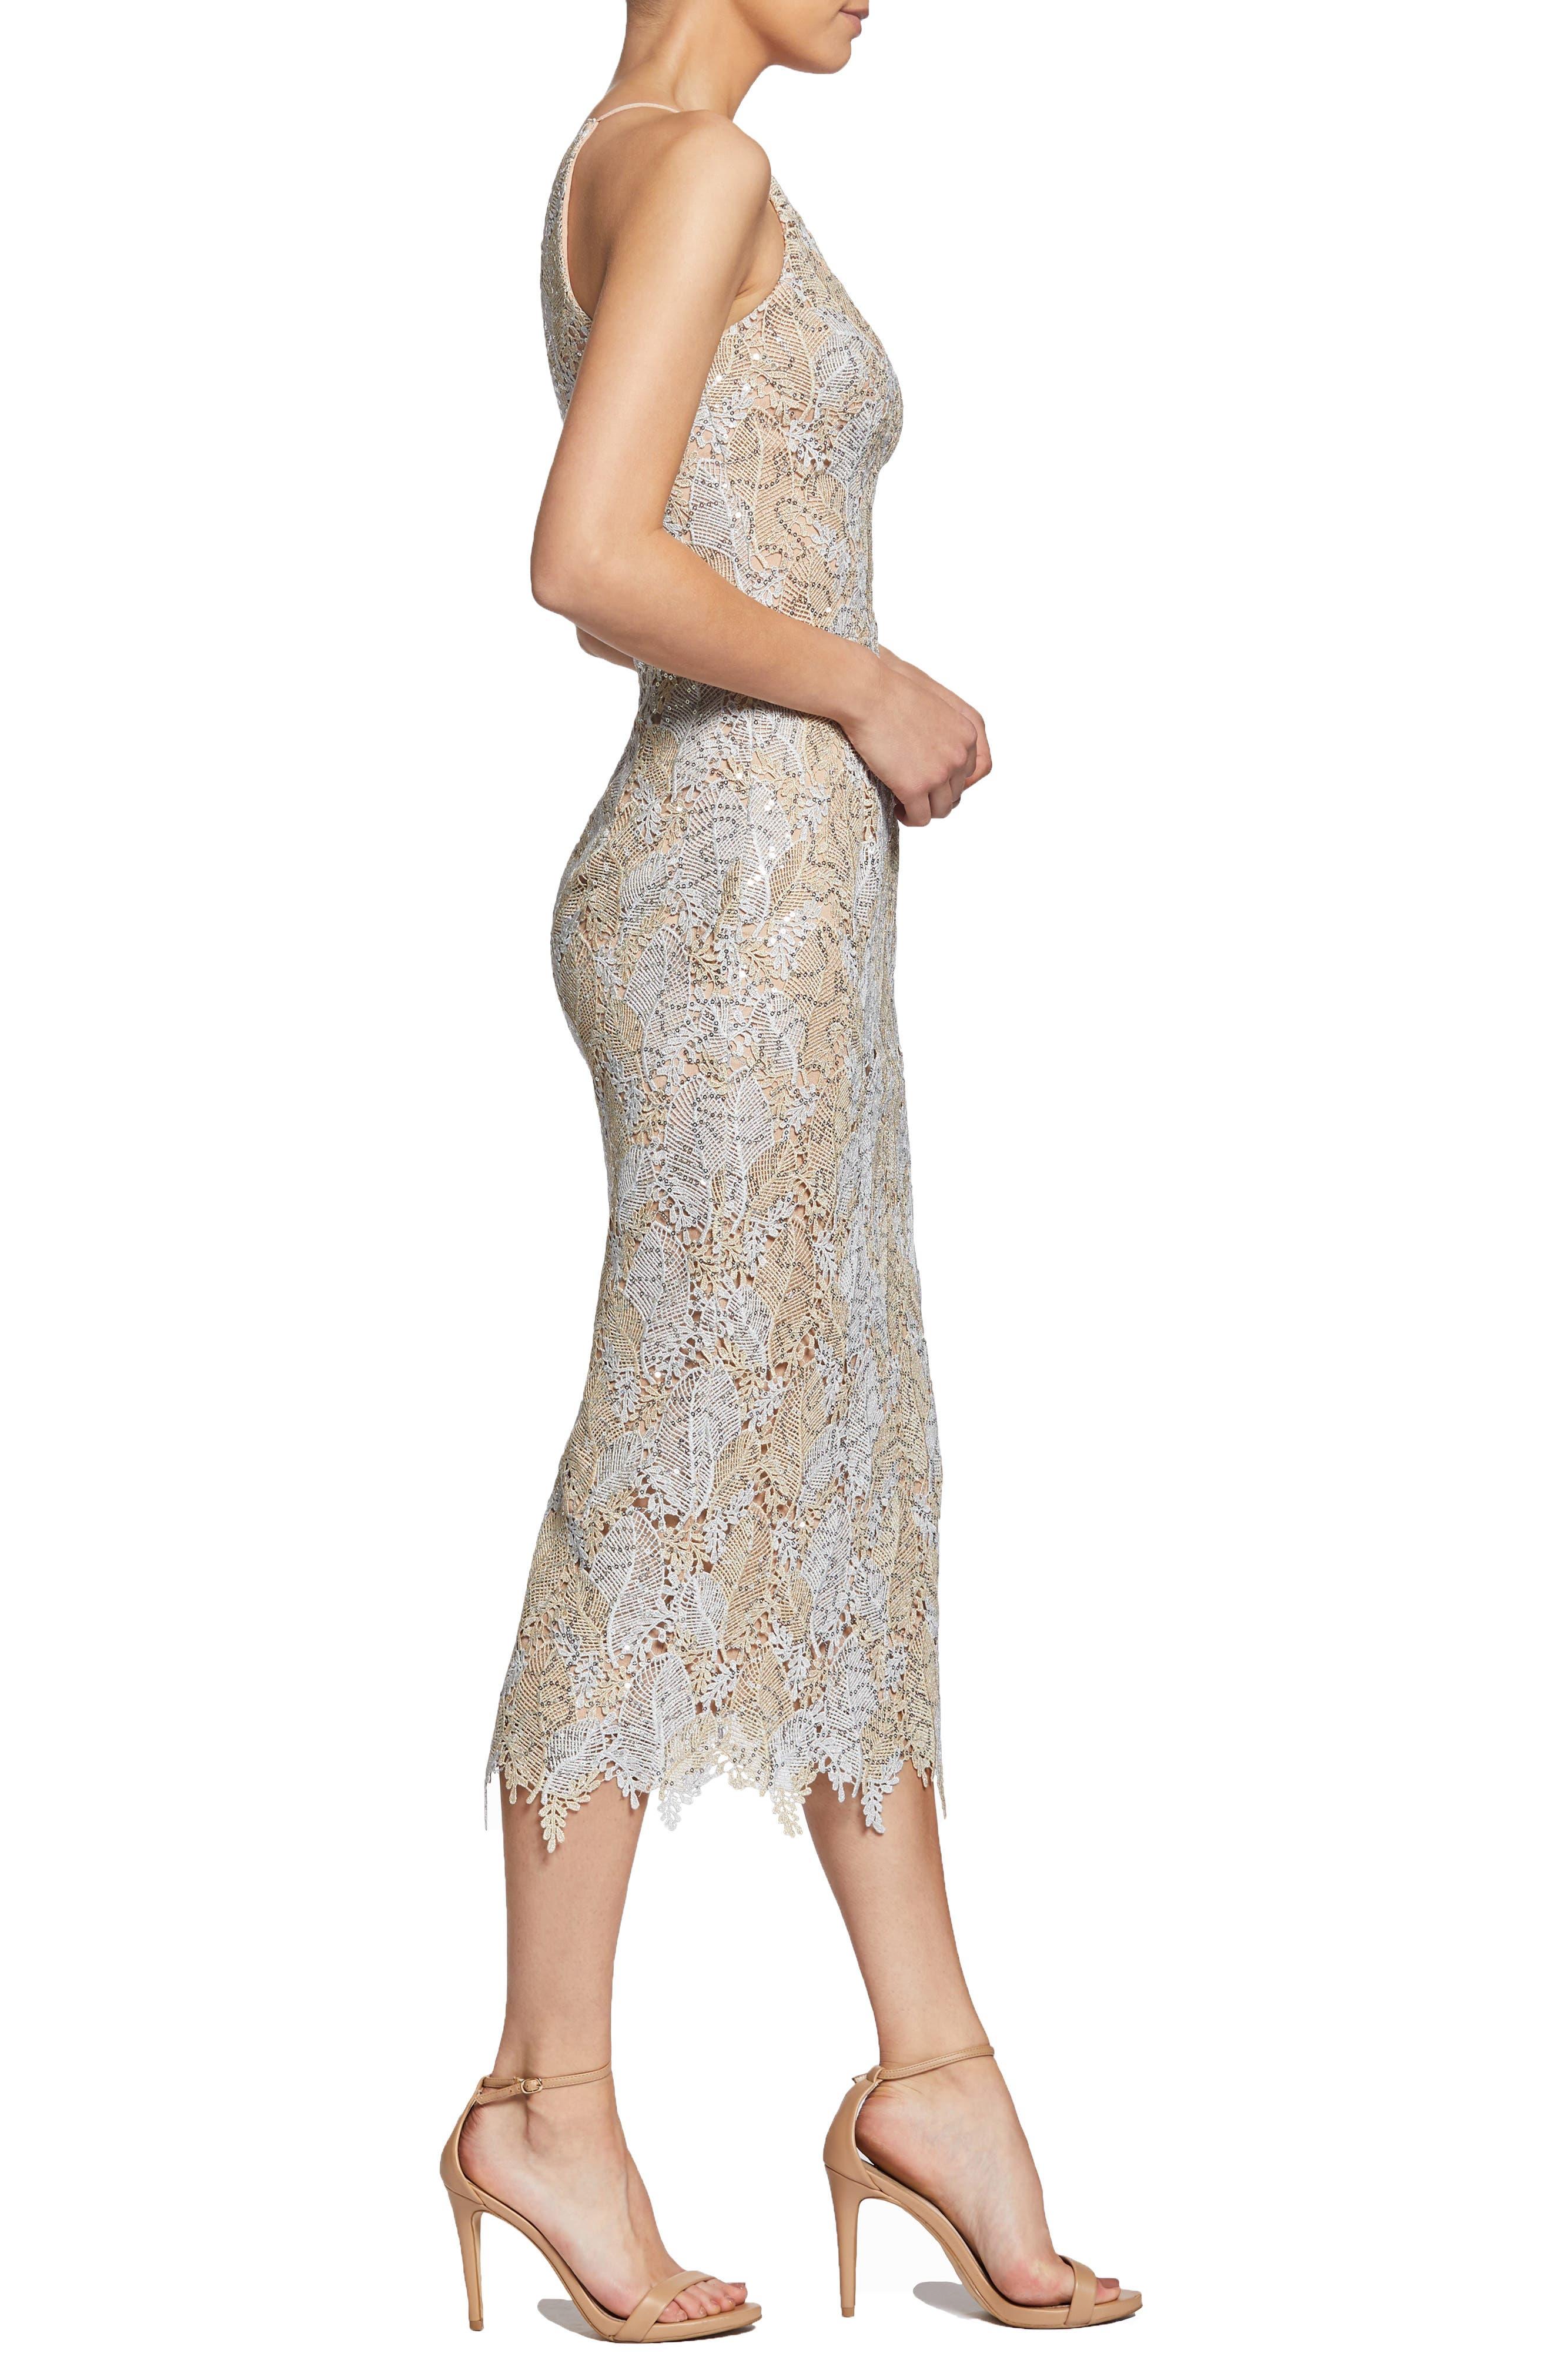 Aurora Lace Sheath Dress,                             Alternate thumbnail 3, color,                             PLATINUM/ GOLD